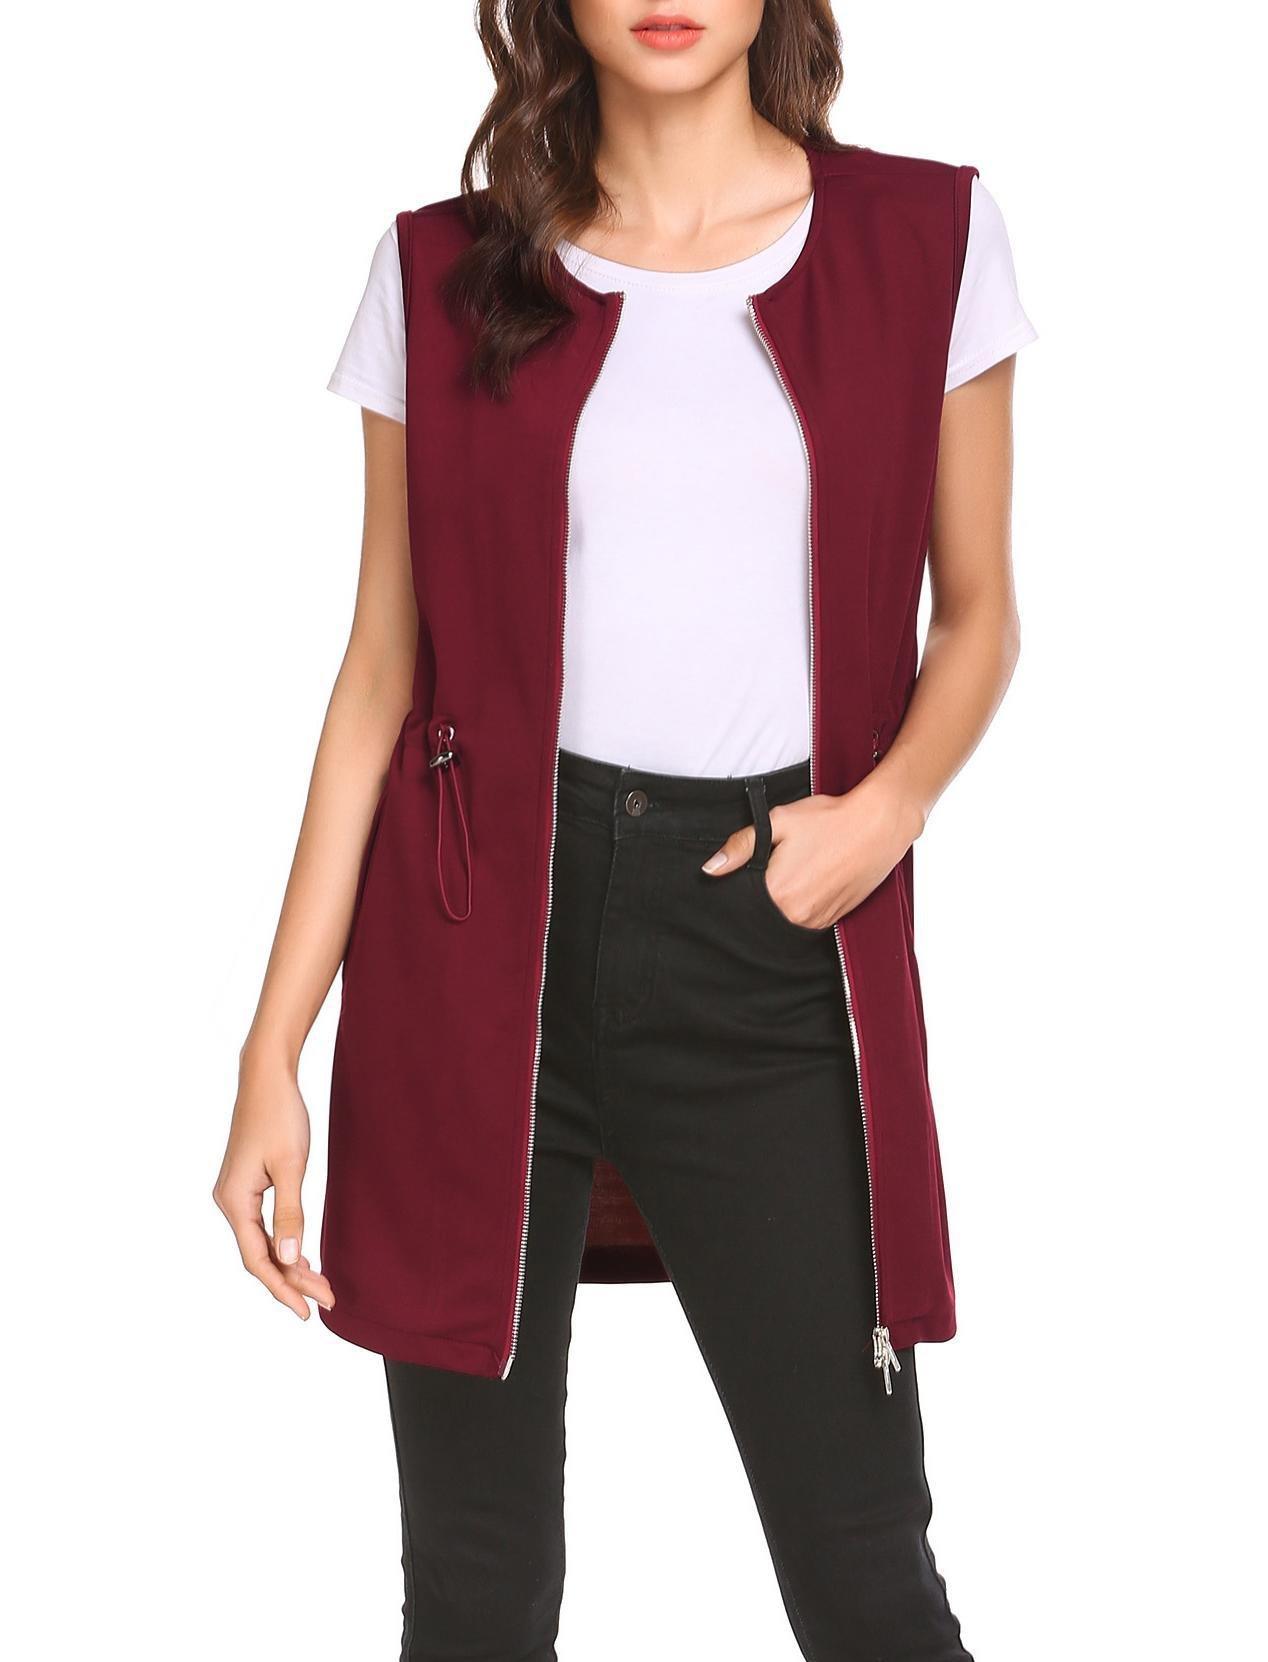 Pinspark Women's Long Sleeveless Zipper Vest Jacket Collarless Cardigan Blazer Burgundy by Pinspark